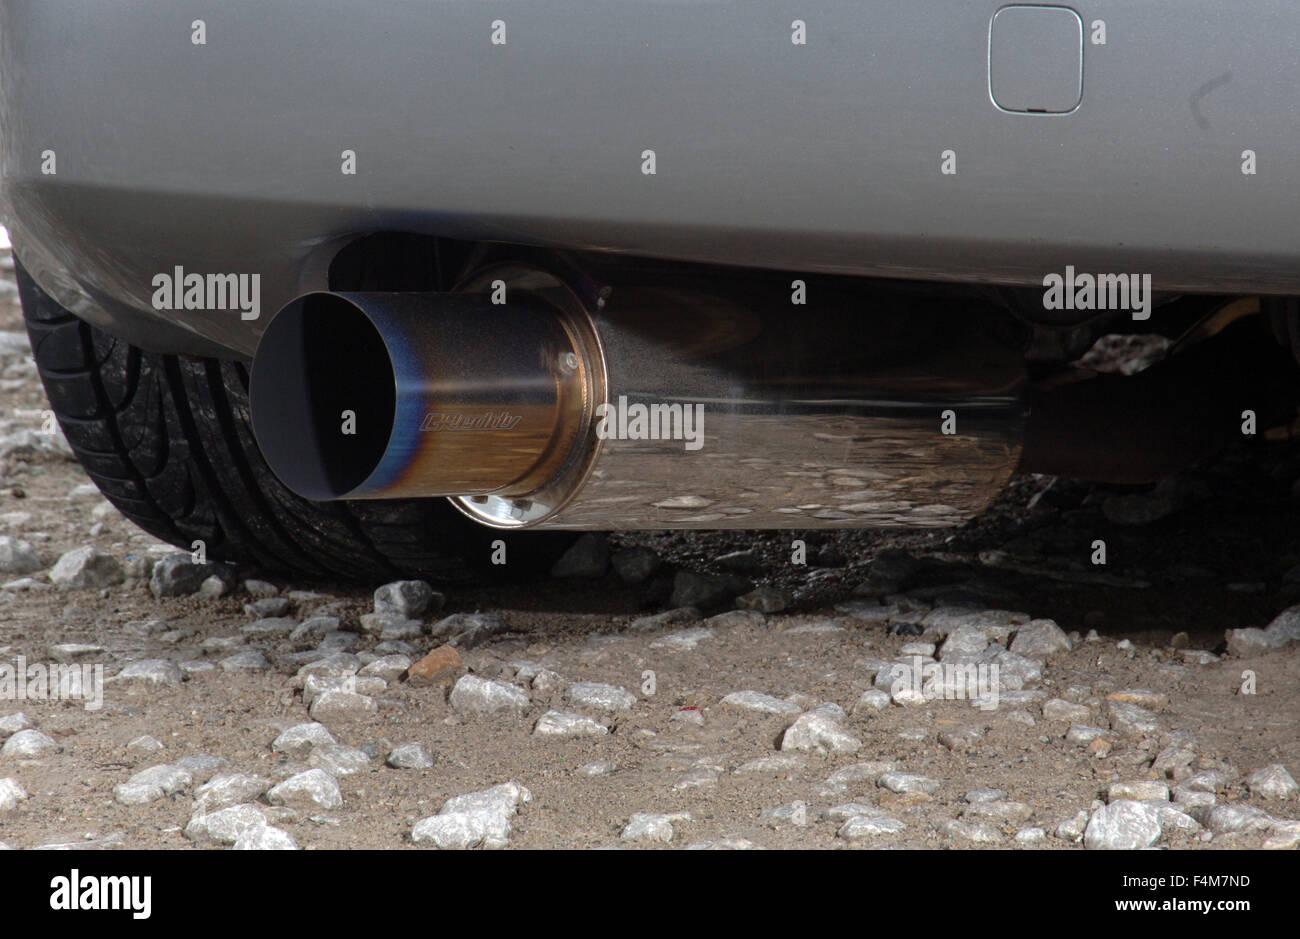 https www alamy com stock photo sports car driving on empty twisting mountain roads nissan 350z tuned 88955593 html